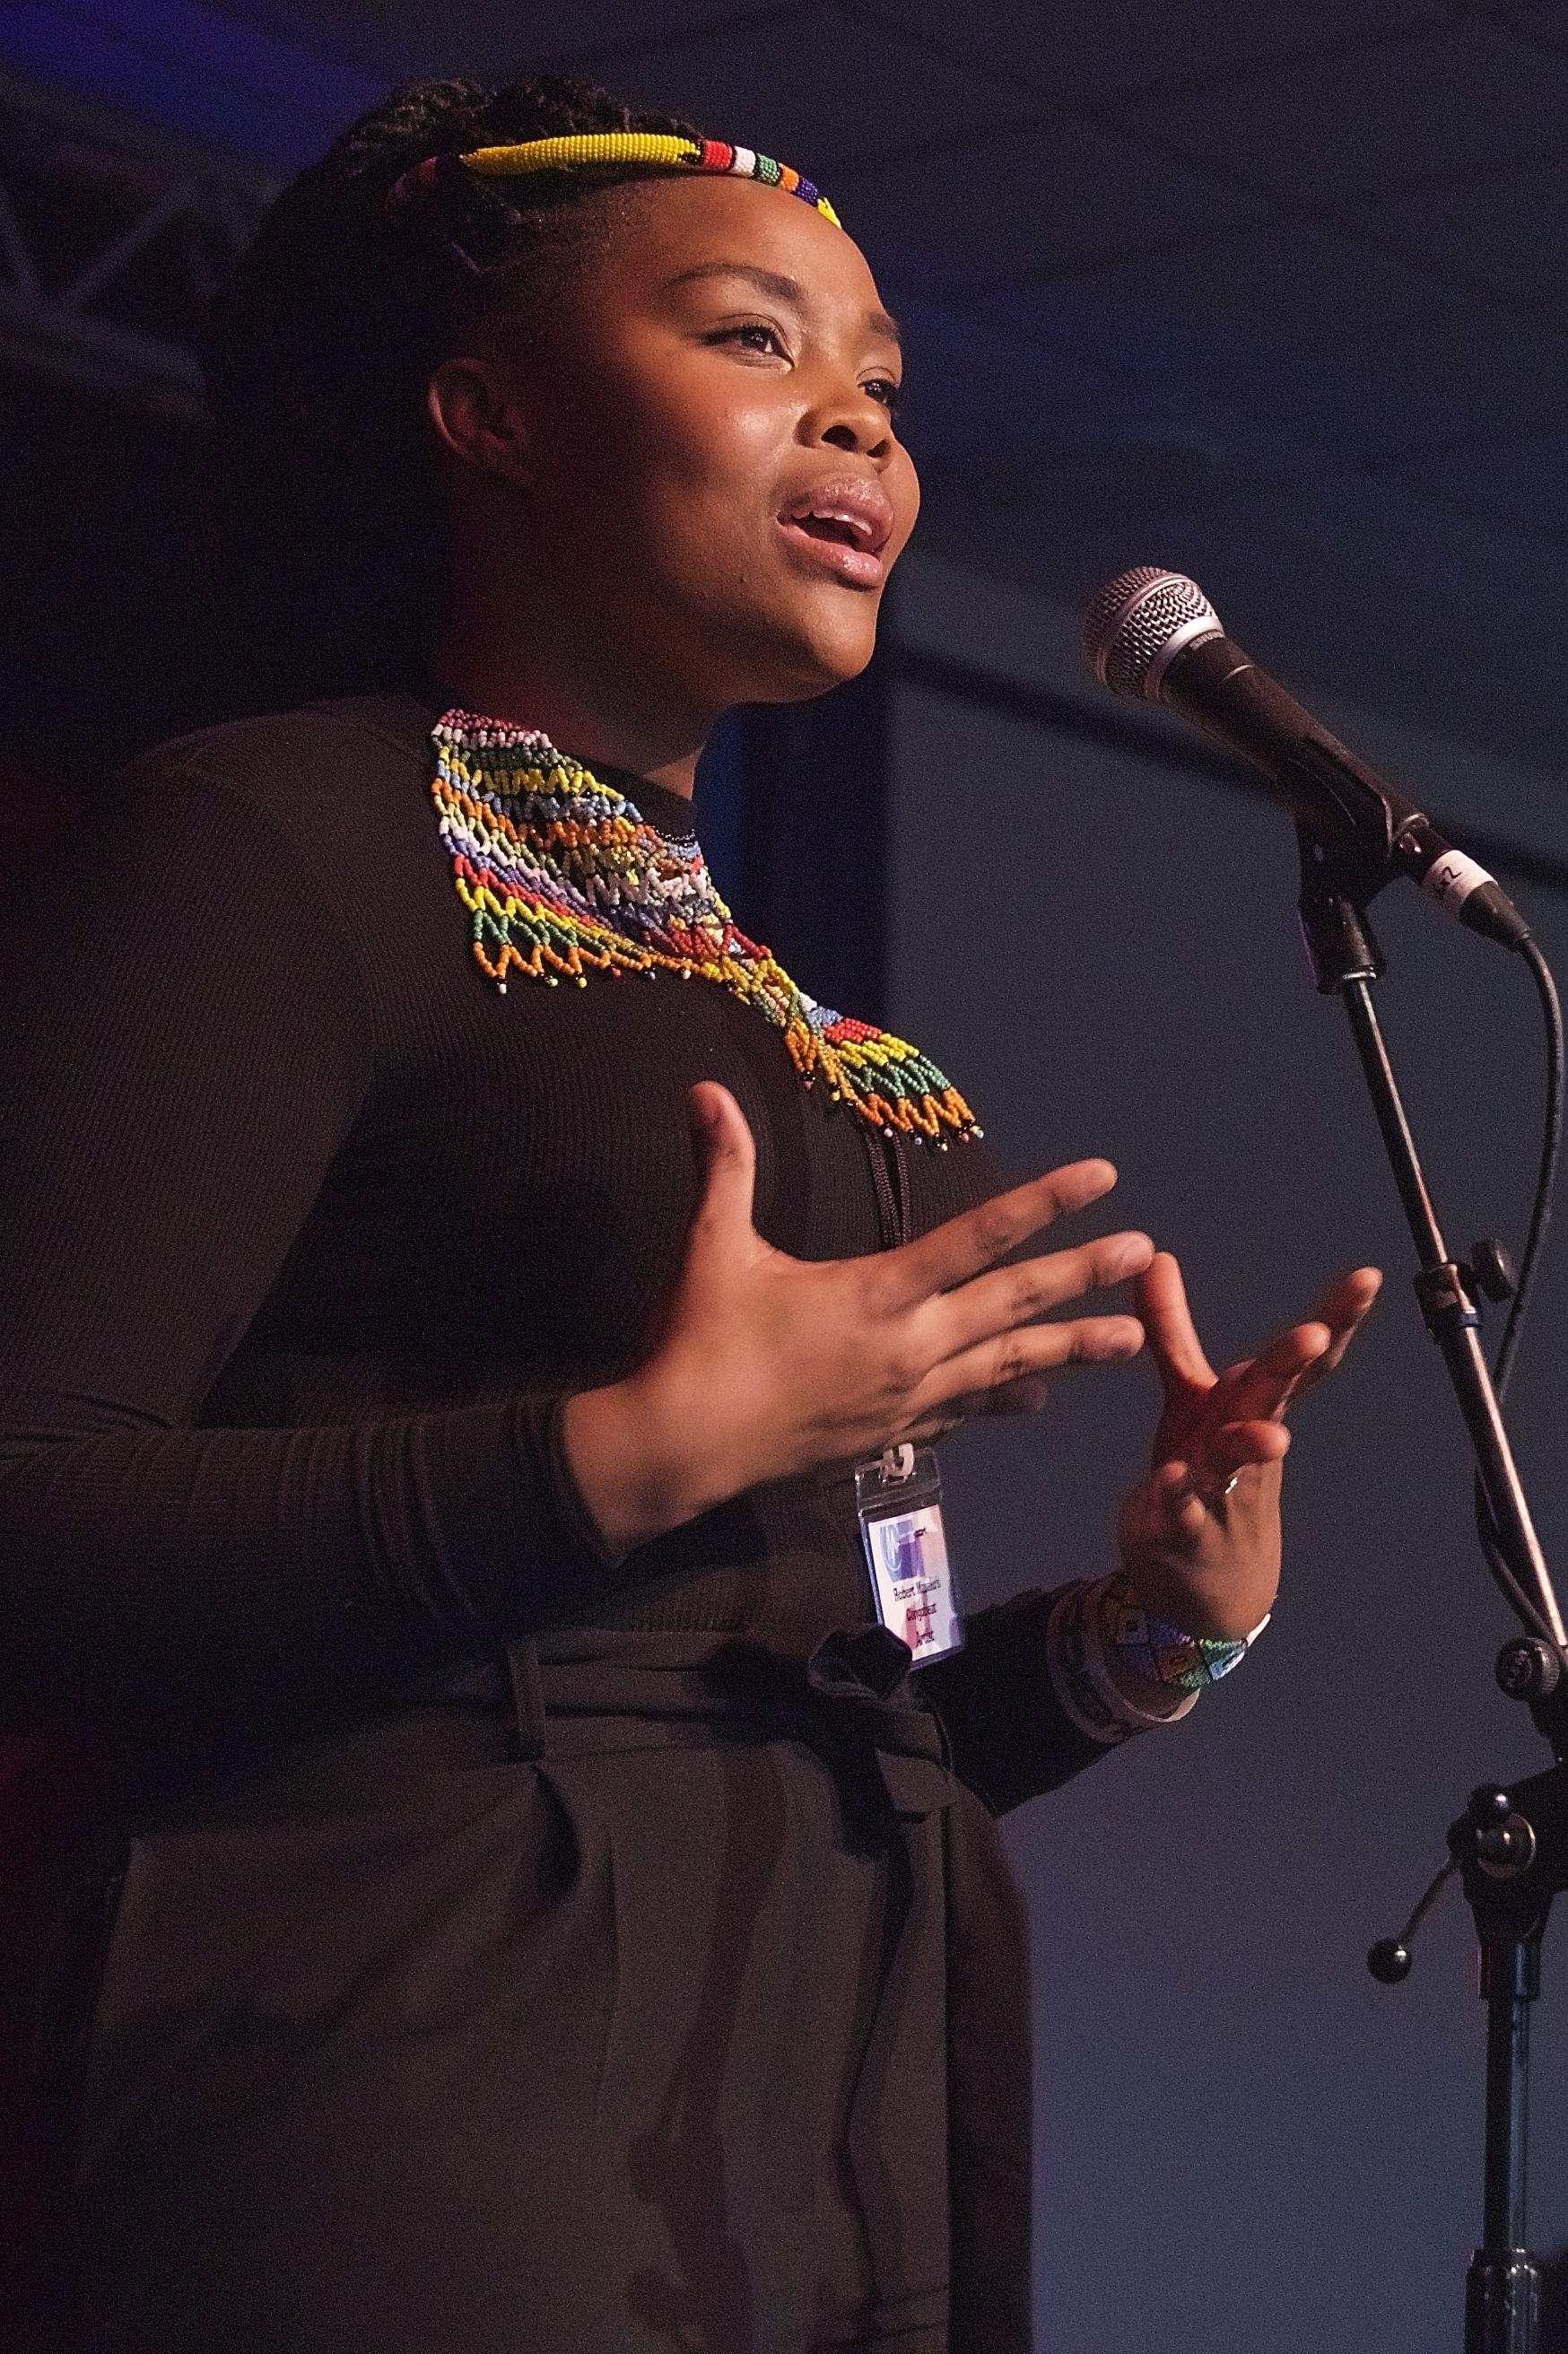 The Congobeat